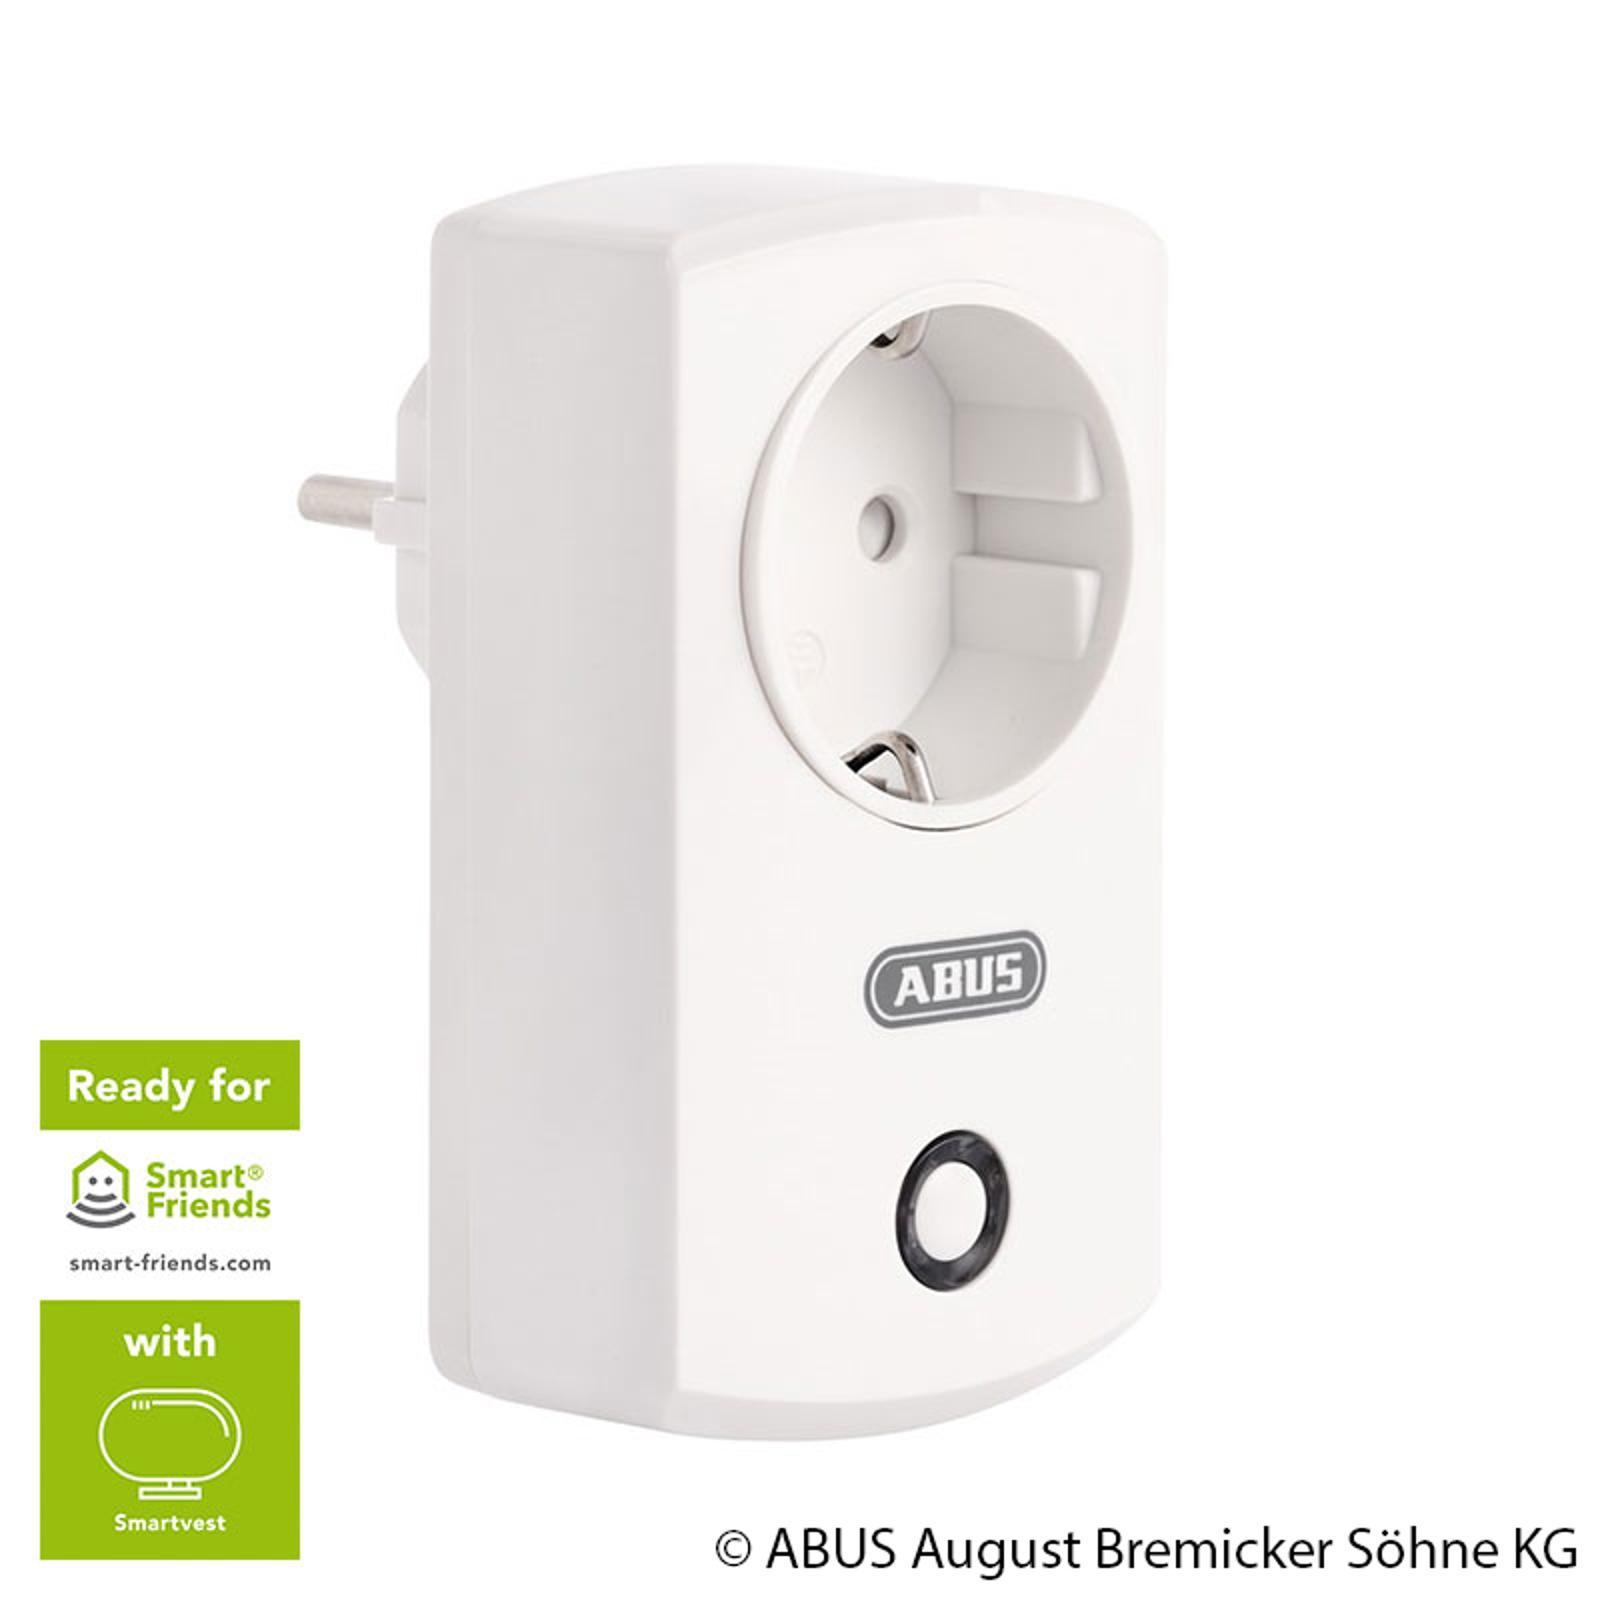 ABUS Smartvest Funk-Steckdose